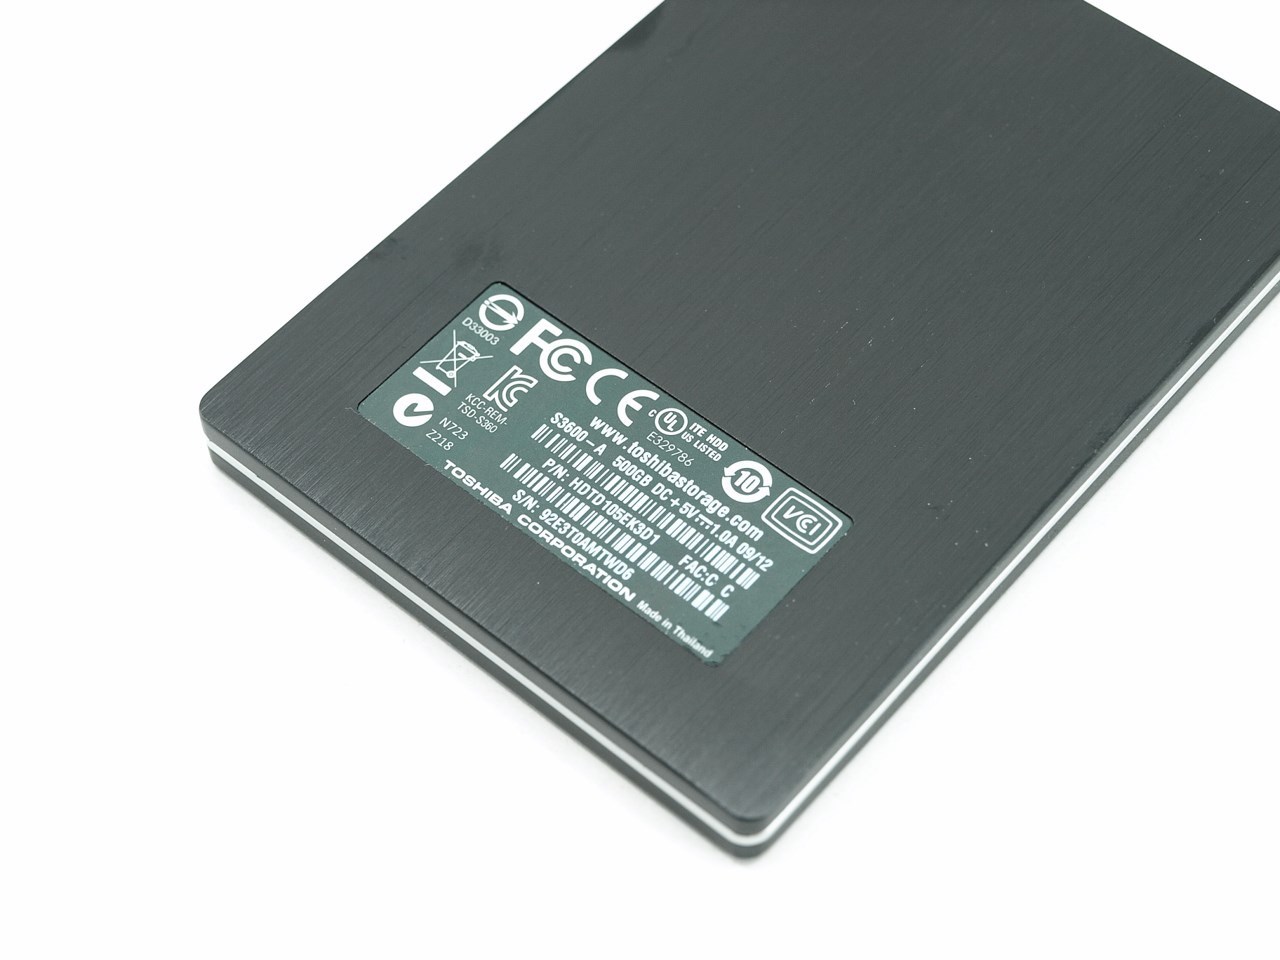 toshiba stor e slim 500gb usb 3 0 portable hard drive review. Black Bedroom Furniture Sets. Home Design Ideas